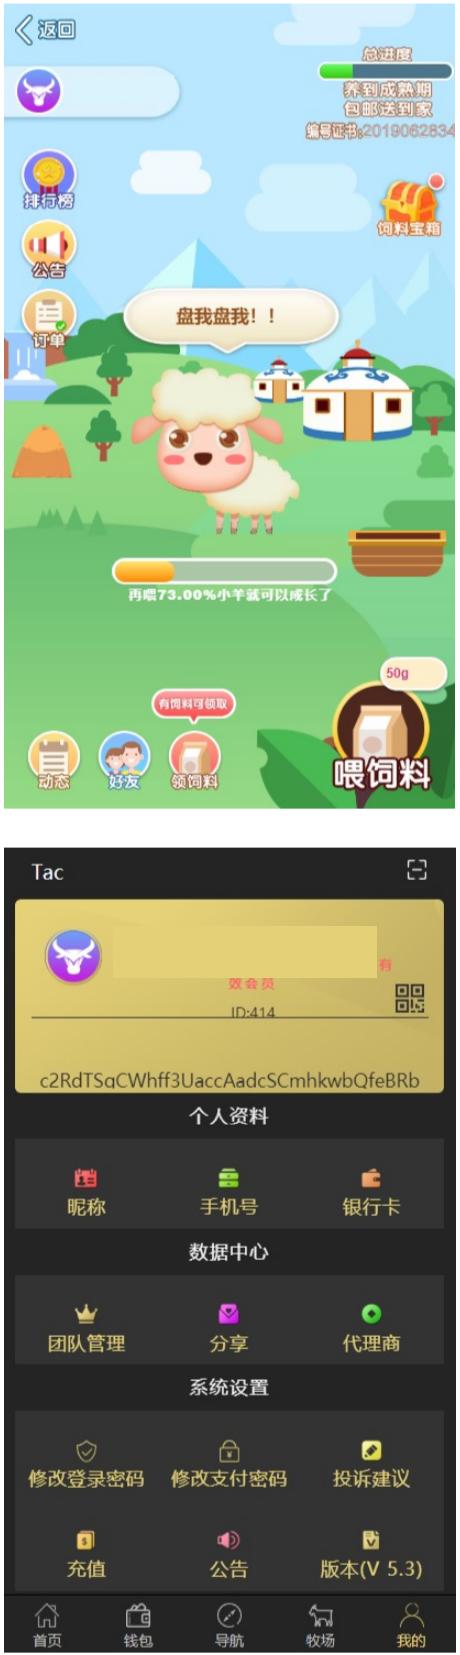 【token虚拟币】农场牧场游戏区块链usdt新版本[多语言+已过D盾清后门]